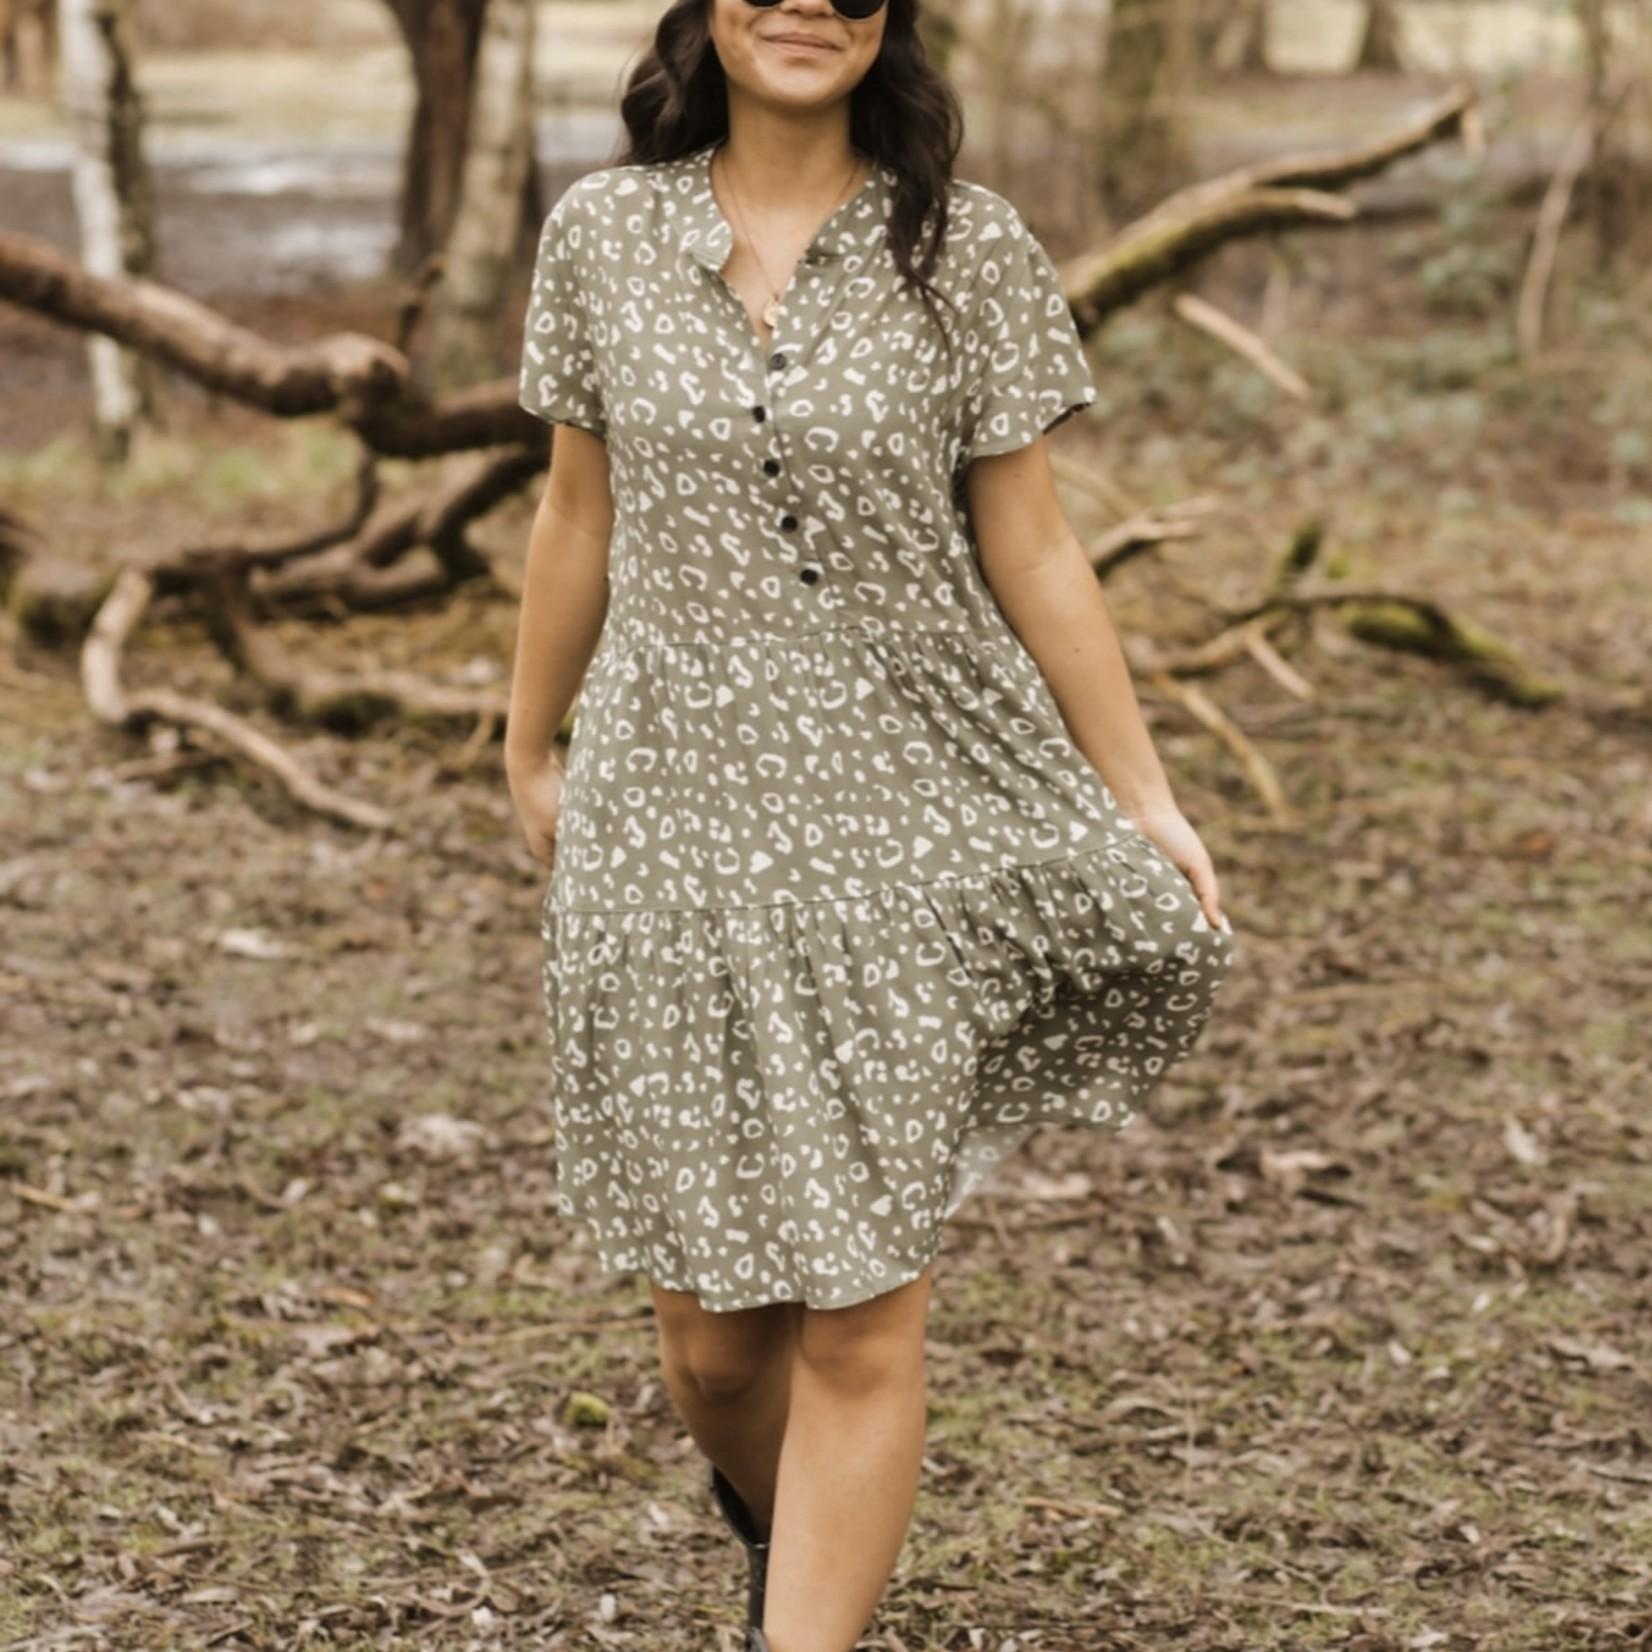 jackson rowe Rollic Dress